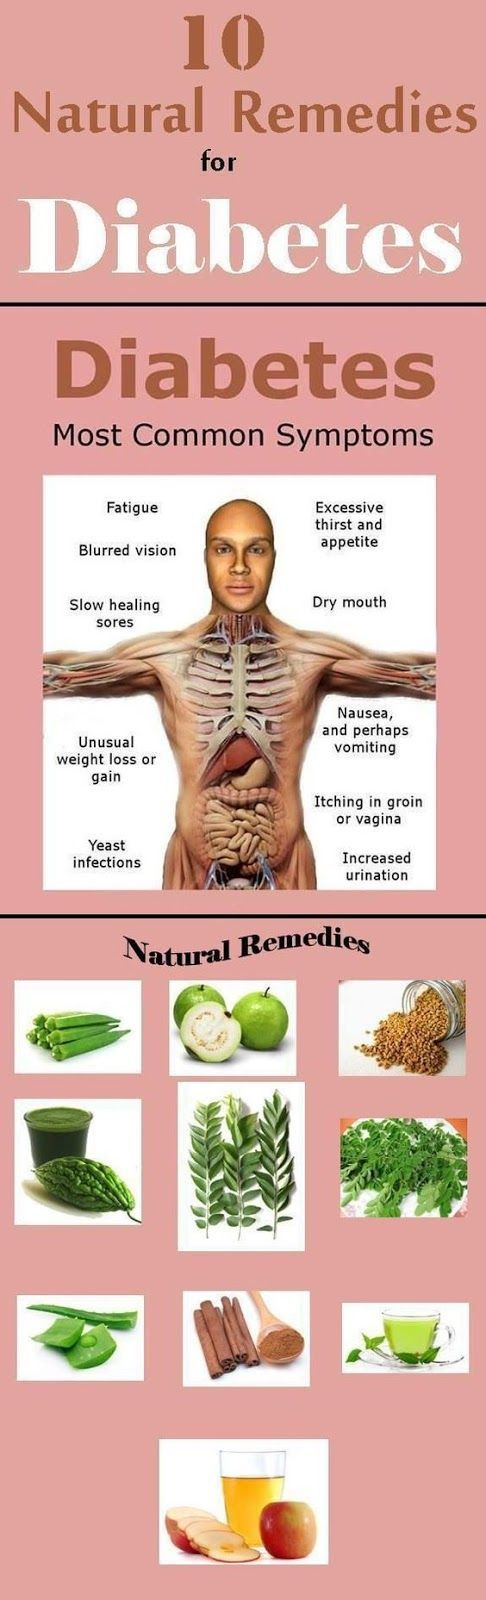 Top 10 Natural Remedies To Control Diabetes